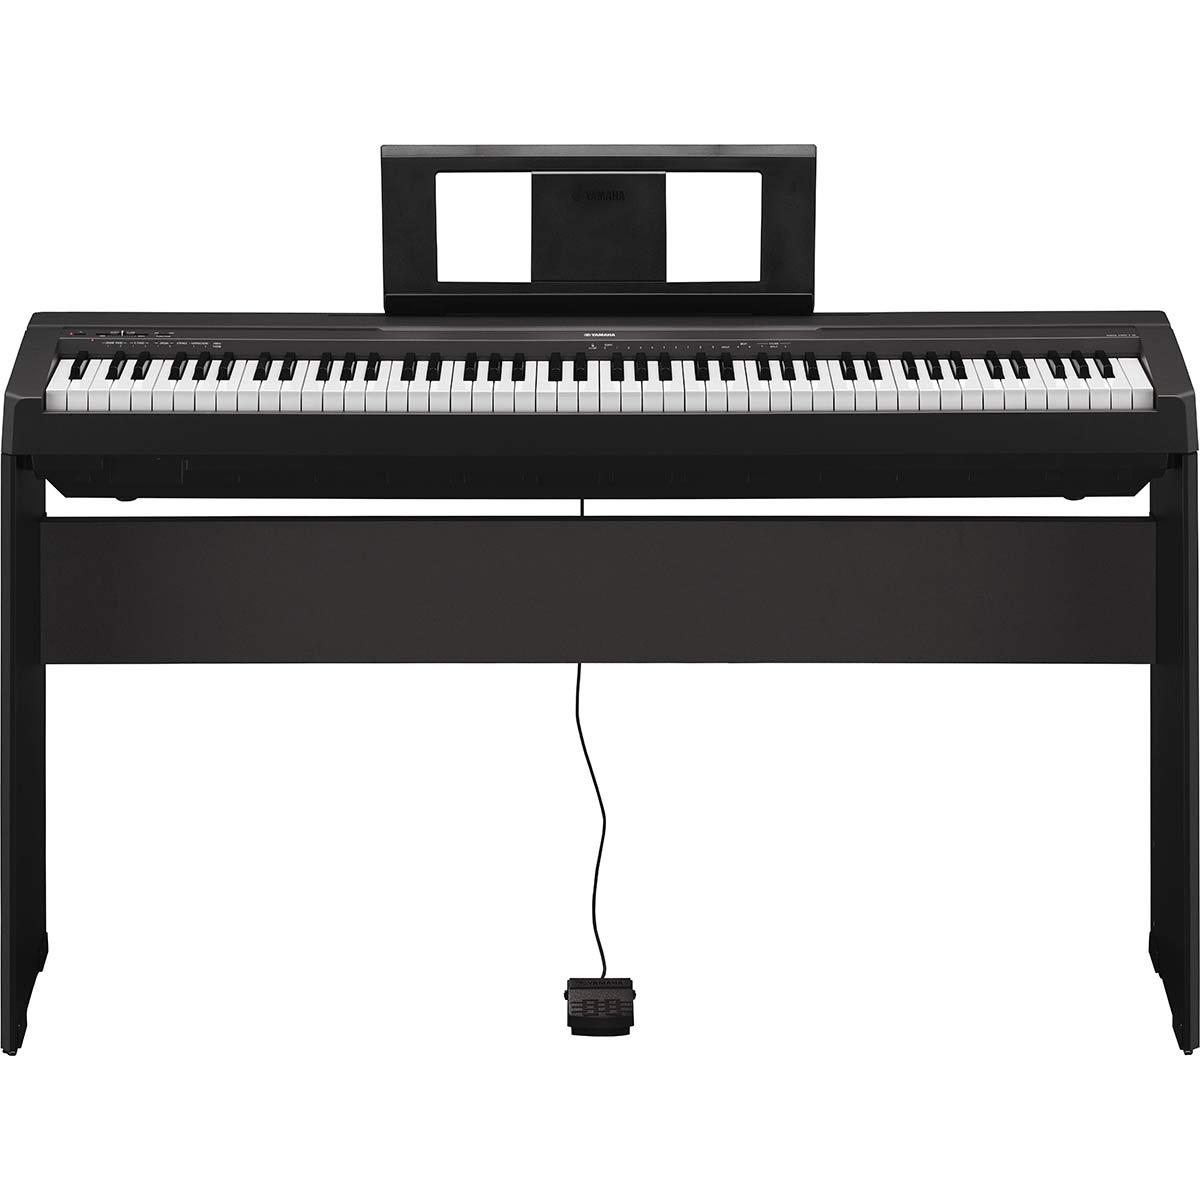 P45 - Piano Digital P 45 - Yamaha